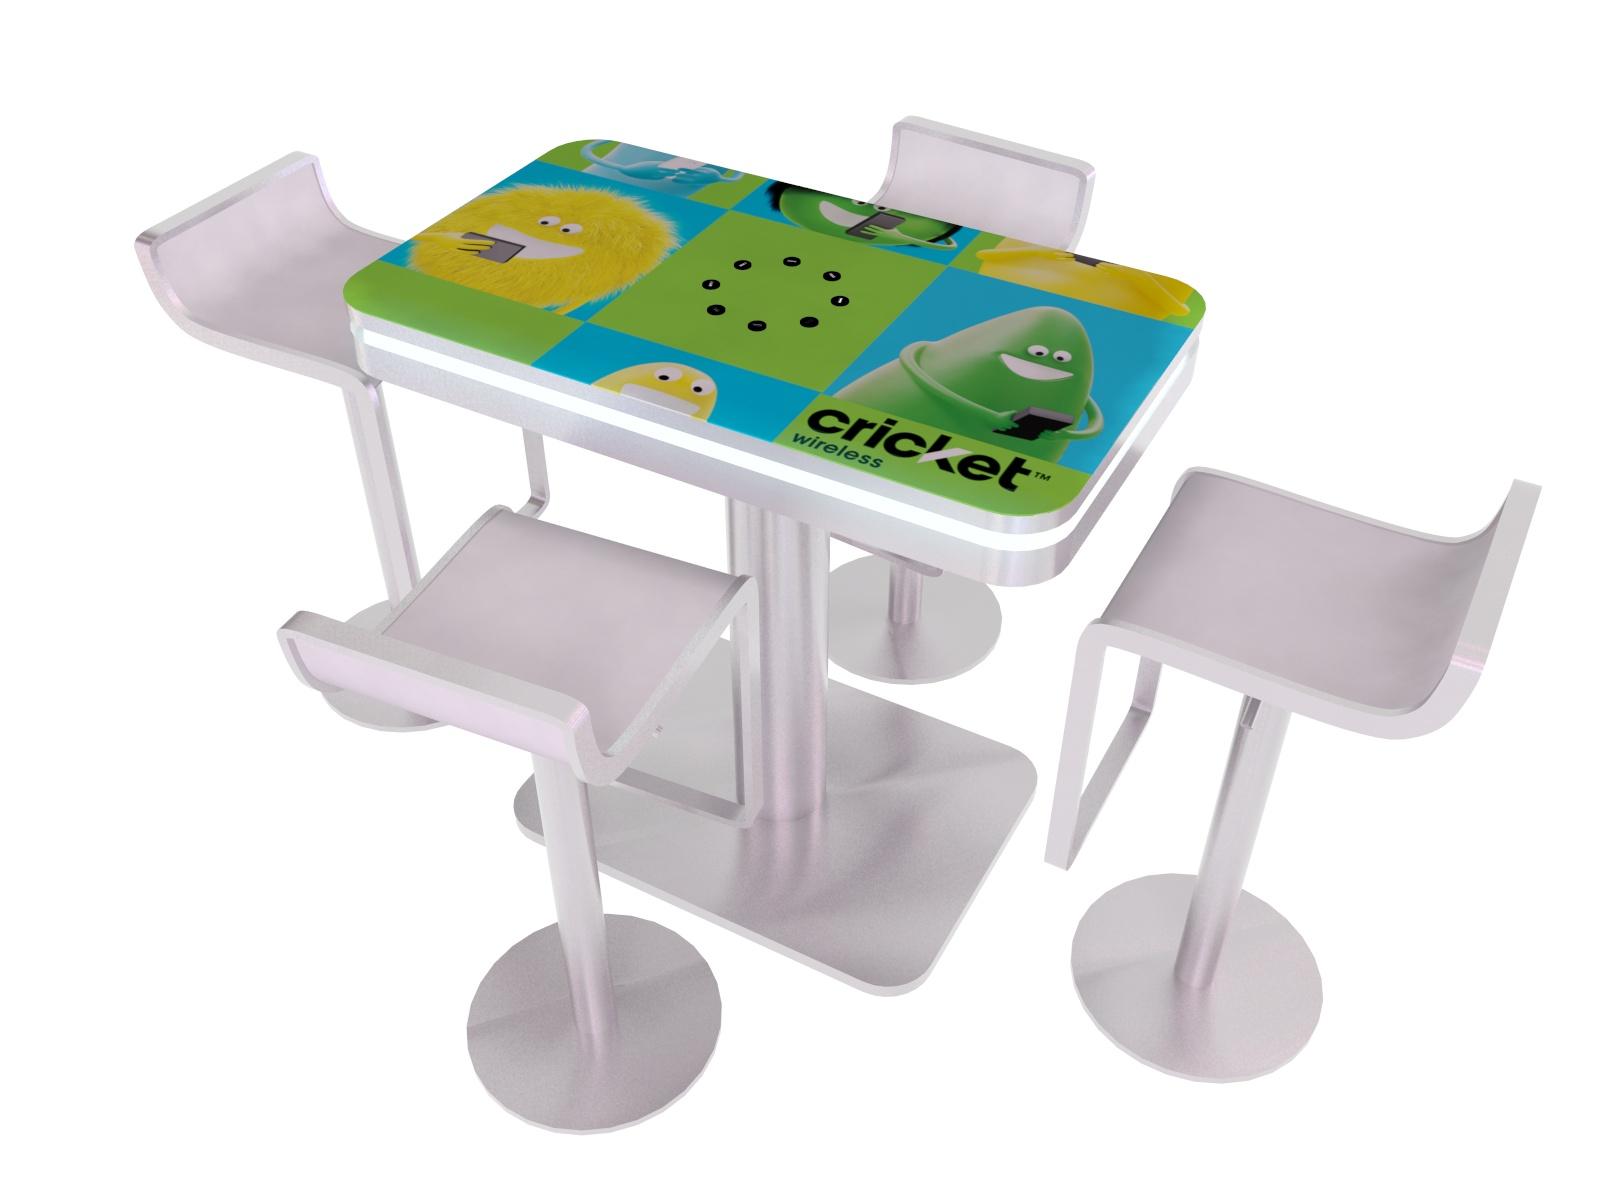 Portable Exhibition Table : Exhibit design search mod portable charging table